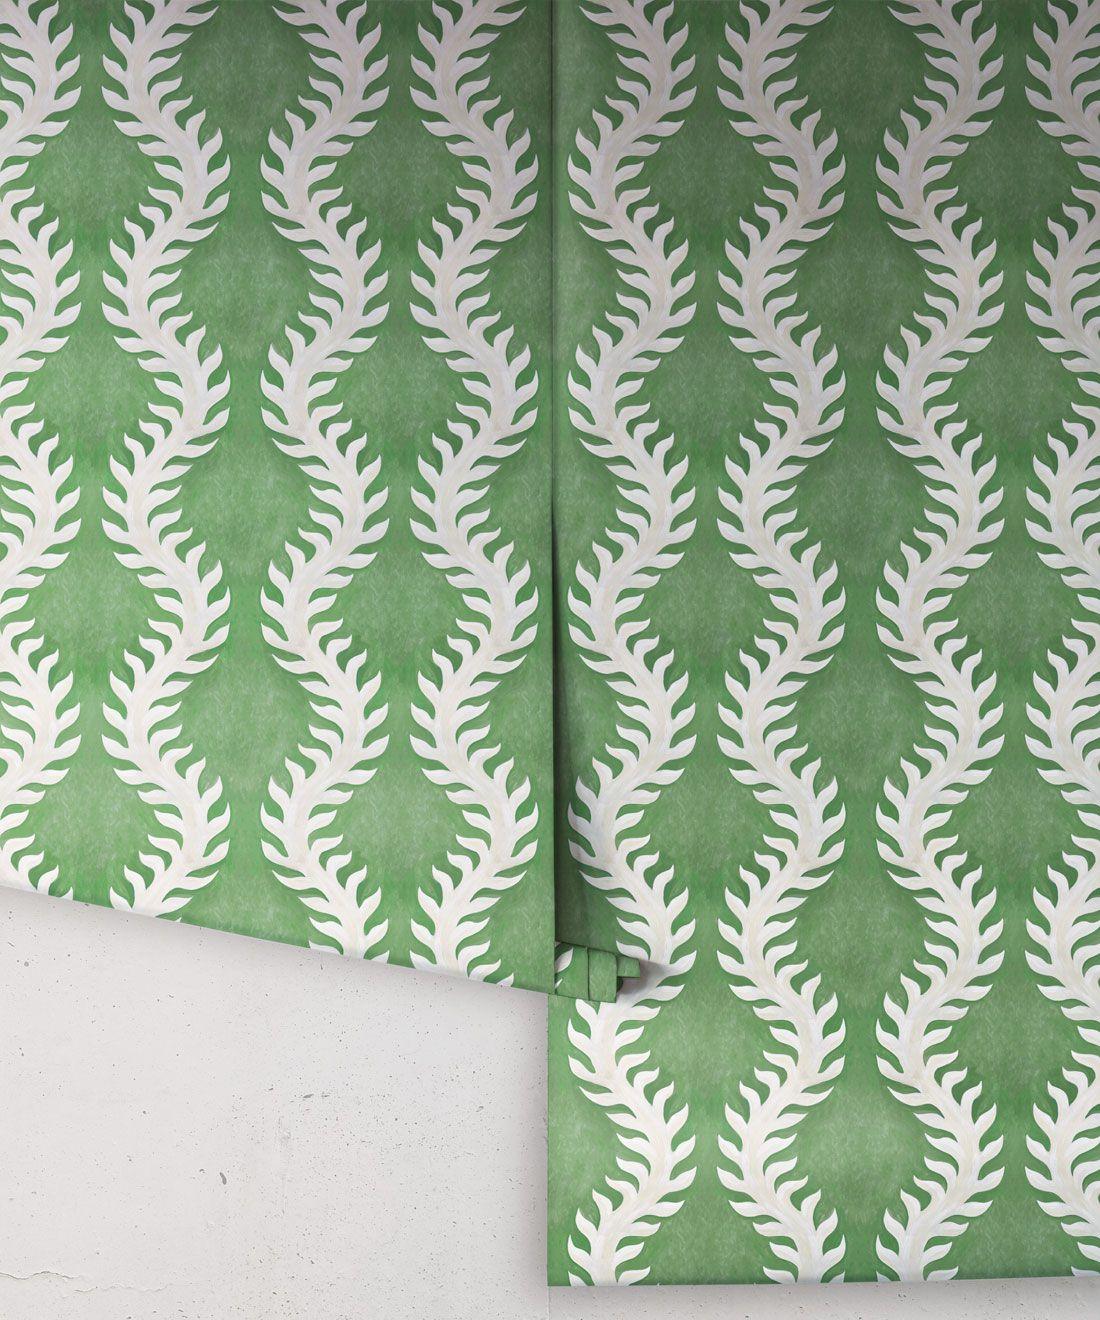 Fern Wallpaper • Green Wallpaper •Rolls